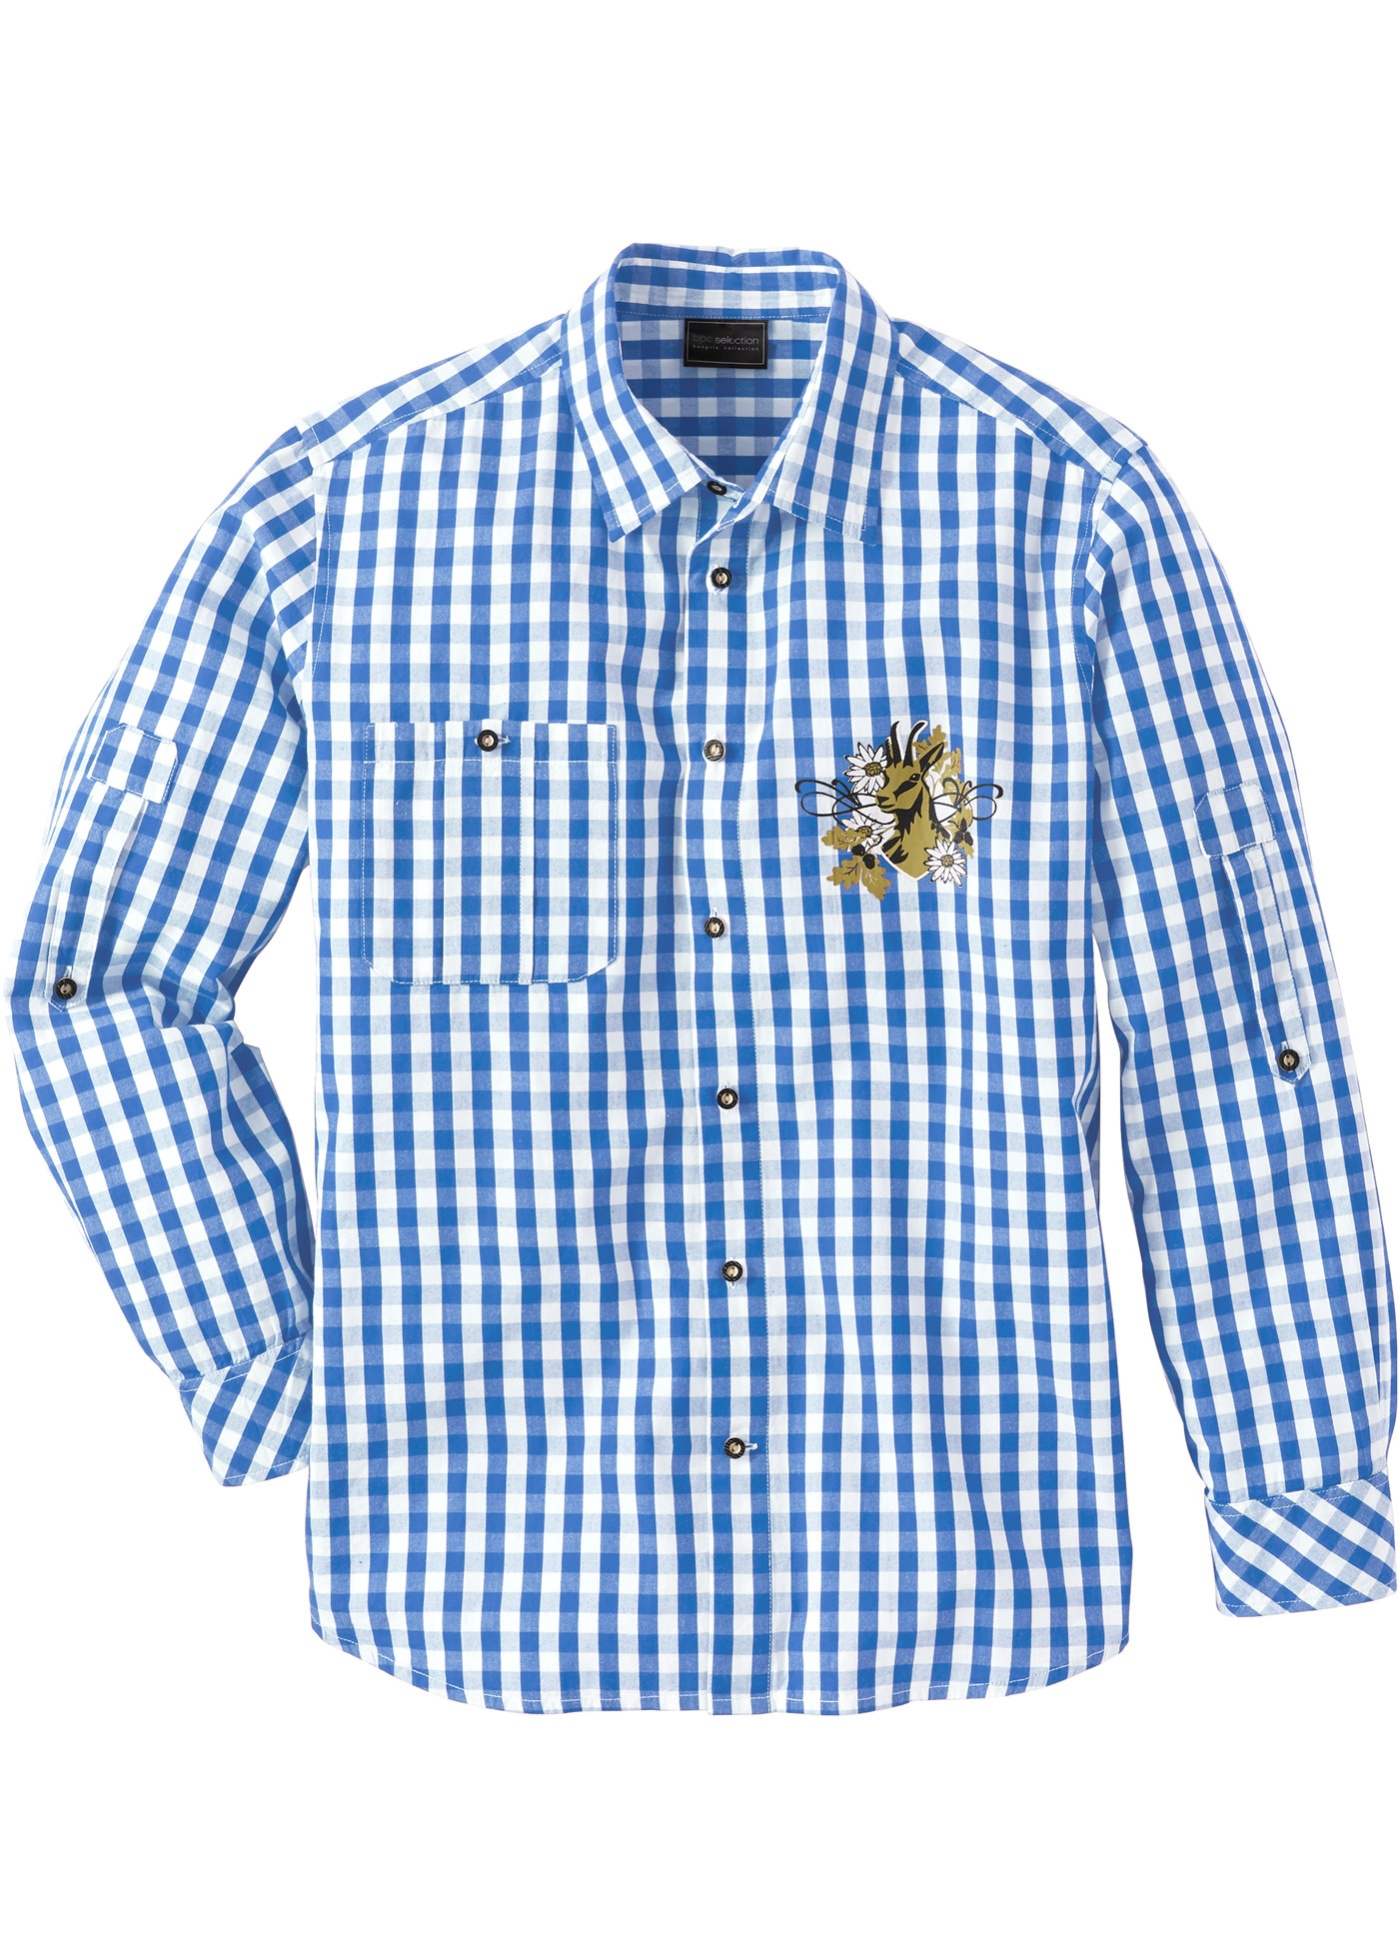 Herren bonprix Trachtenhemd im Regular Fit   06923933669479